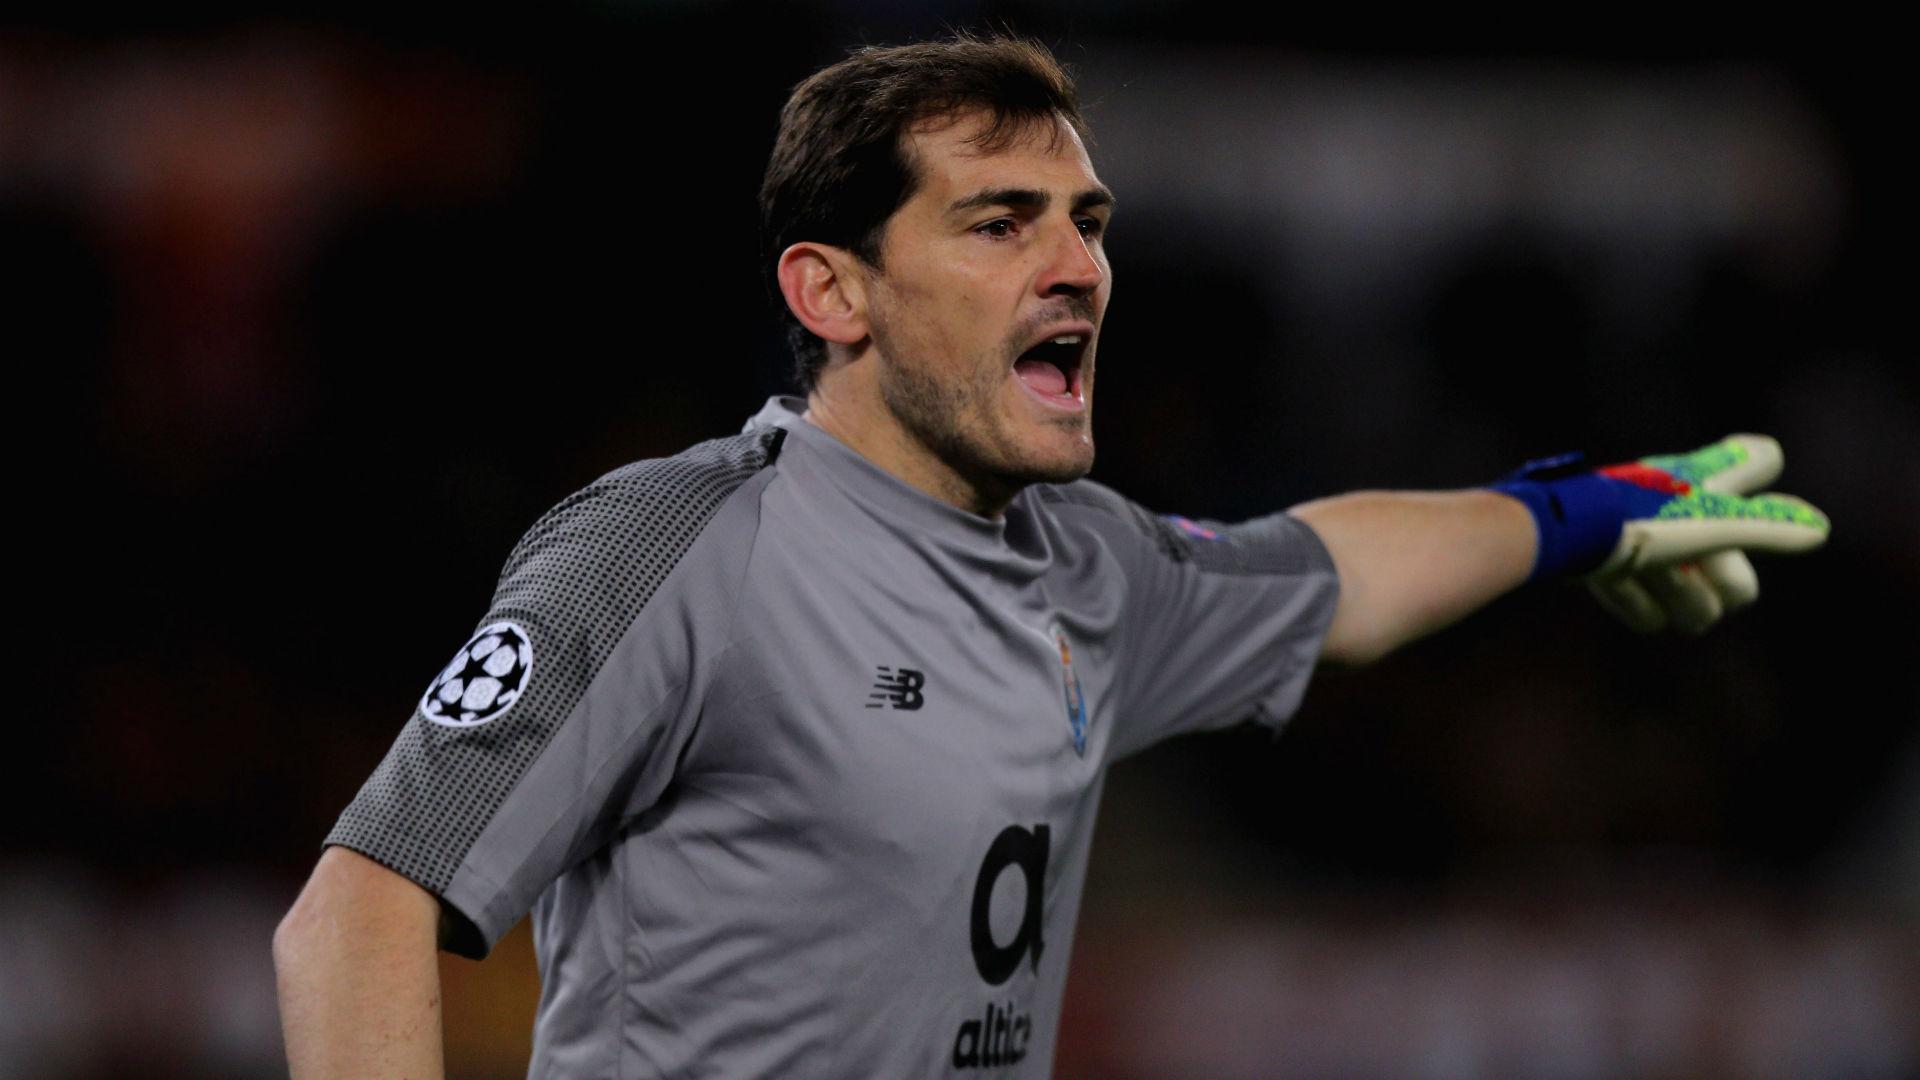 Casillas has retired after RFEF leadership bid, says Porto president